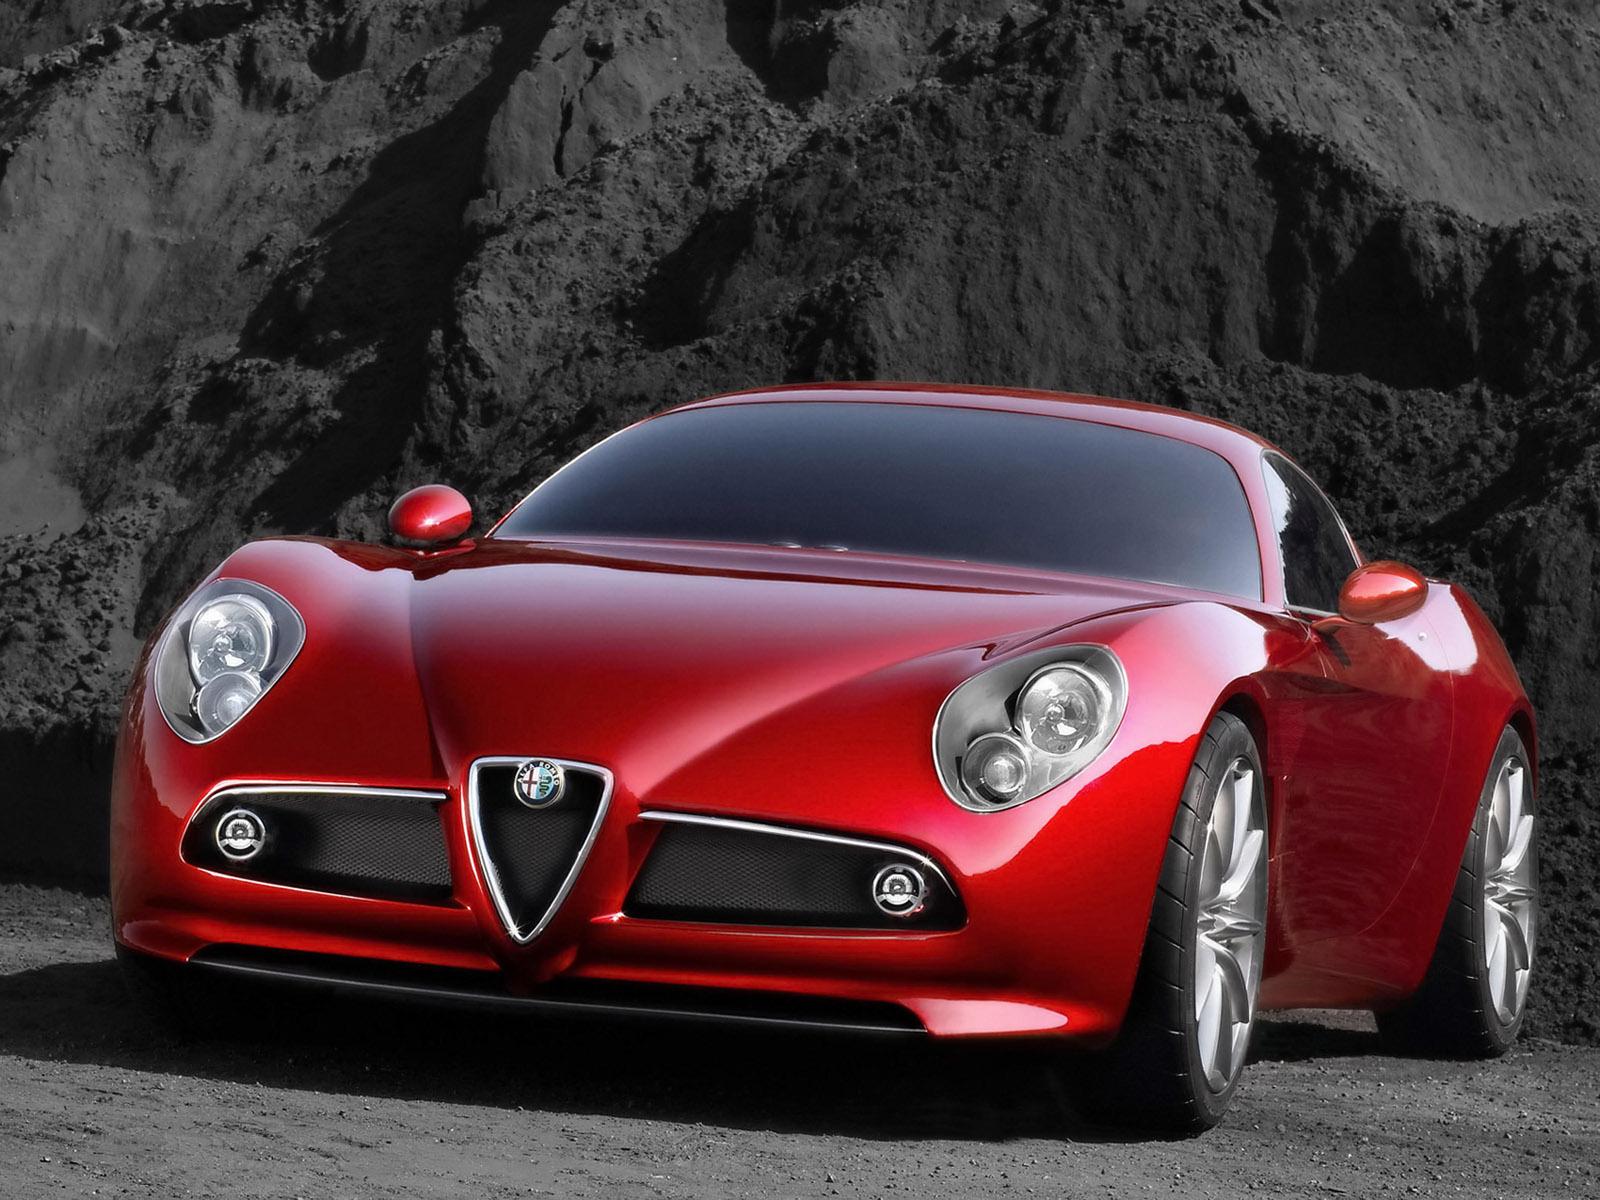 http://1.bp.blogspot.com/-bS7E5n0bhiY/TVxd_gCIXhI/AAAAAAAAA7c/2KjnYatGIiM/s1600/Alfa-Romeo-8C-Competizione-Wallpaper_17220113.jpg